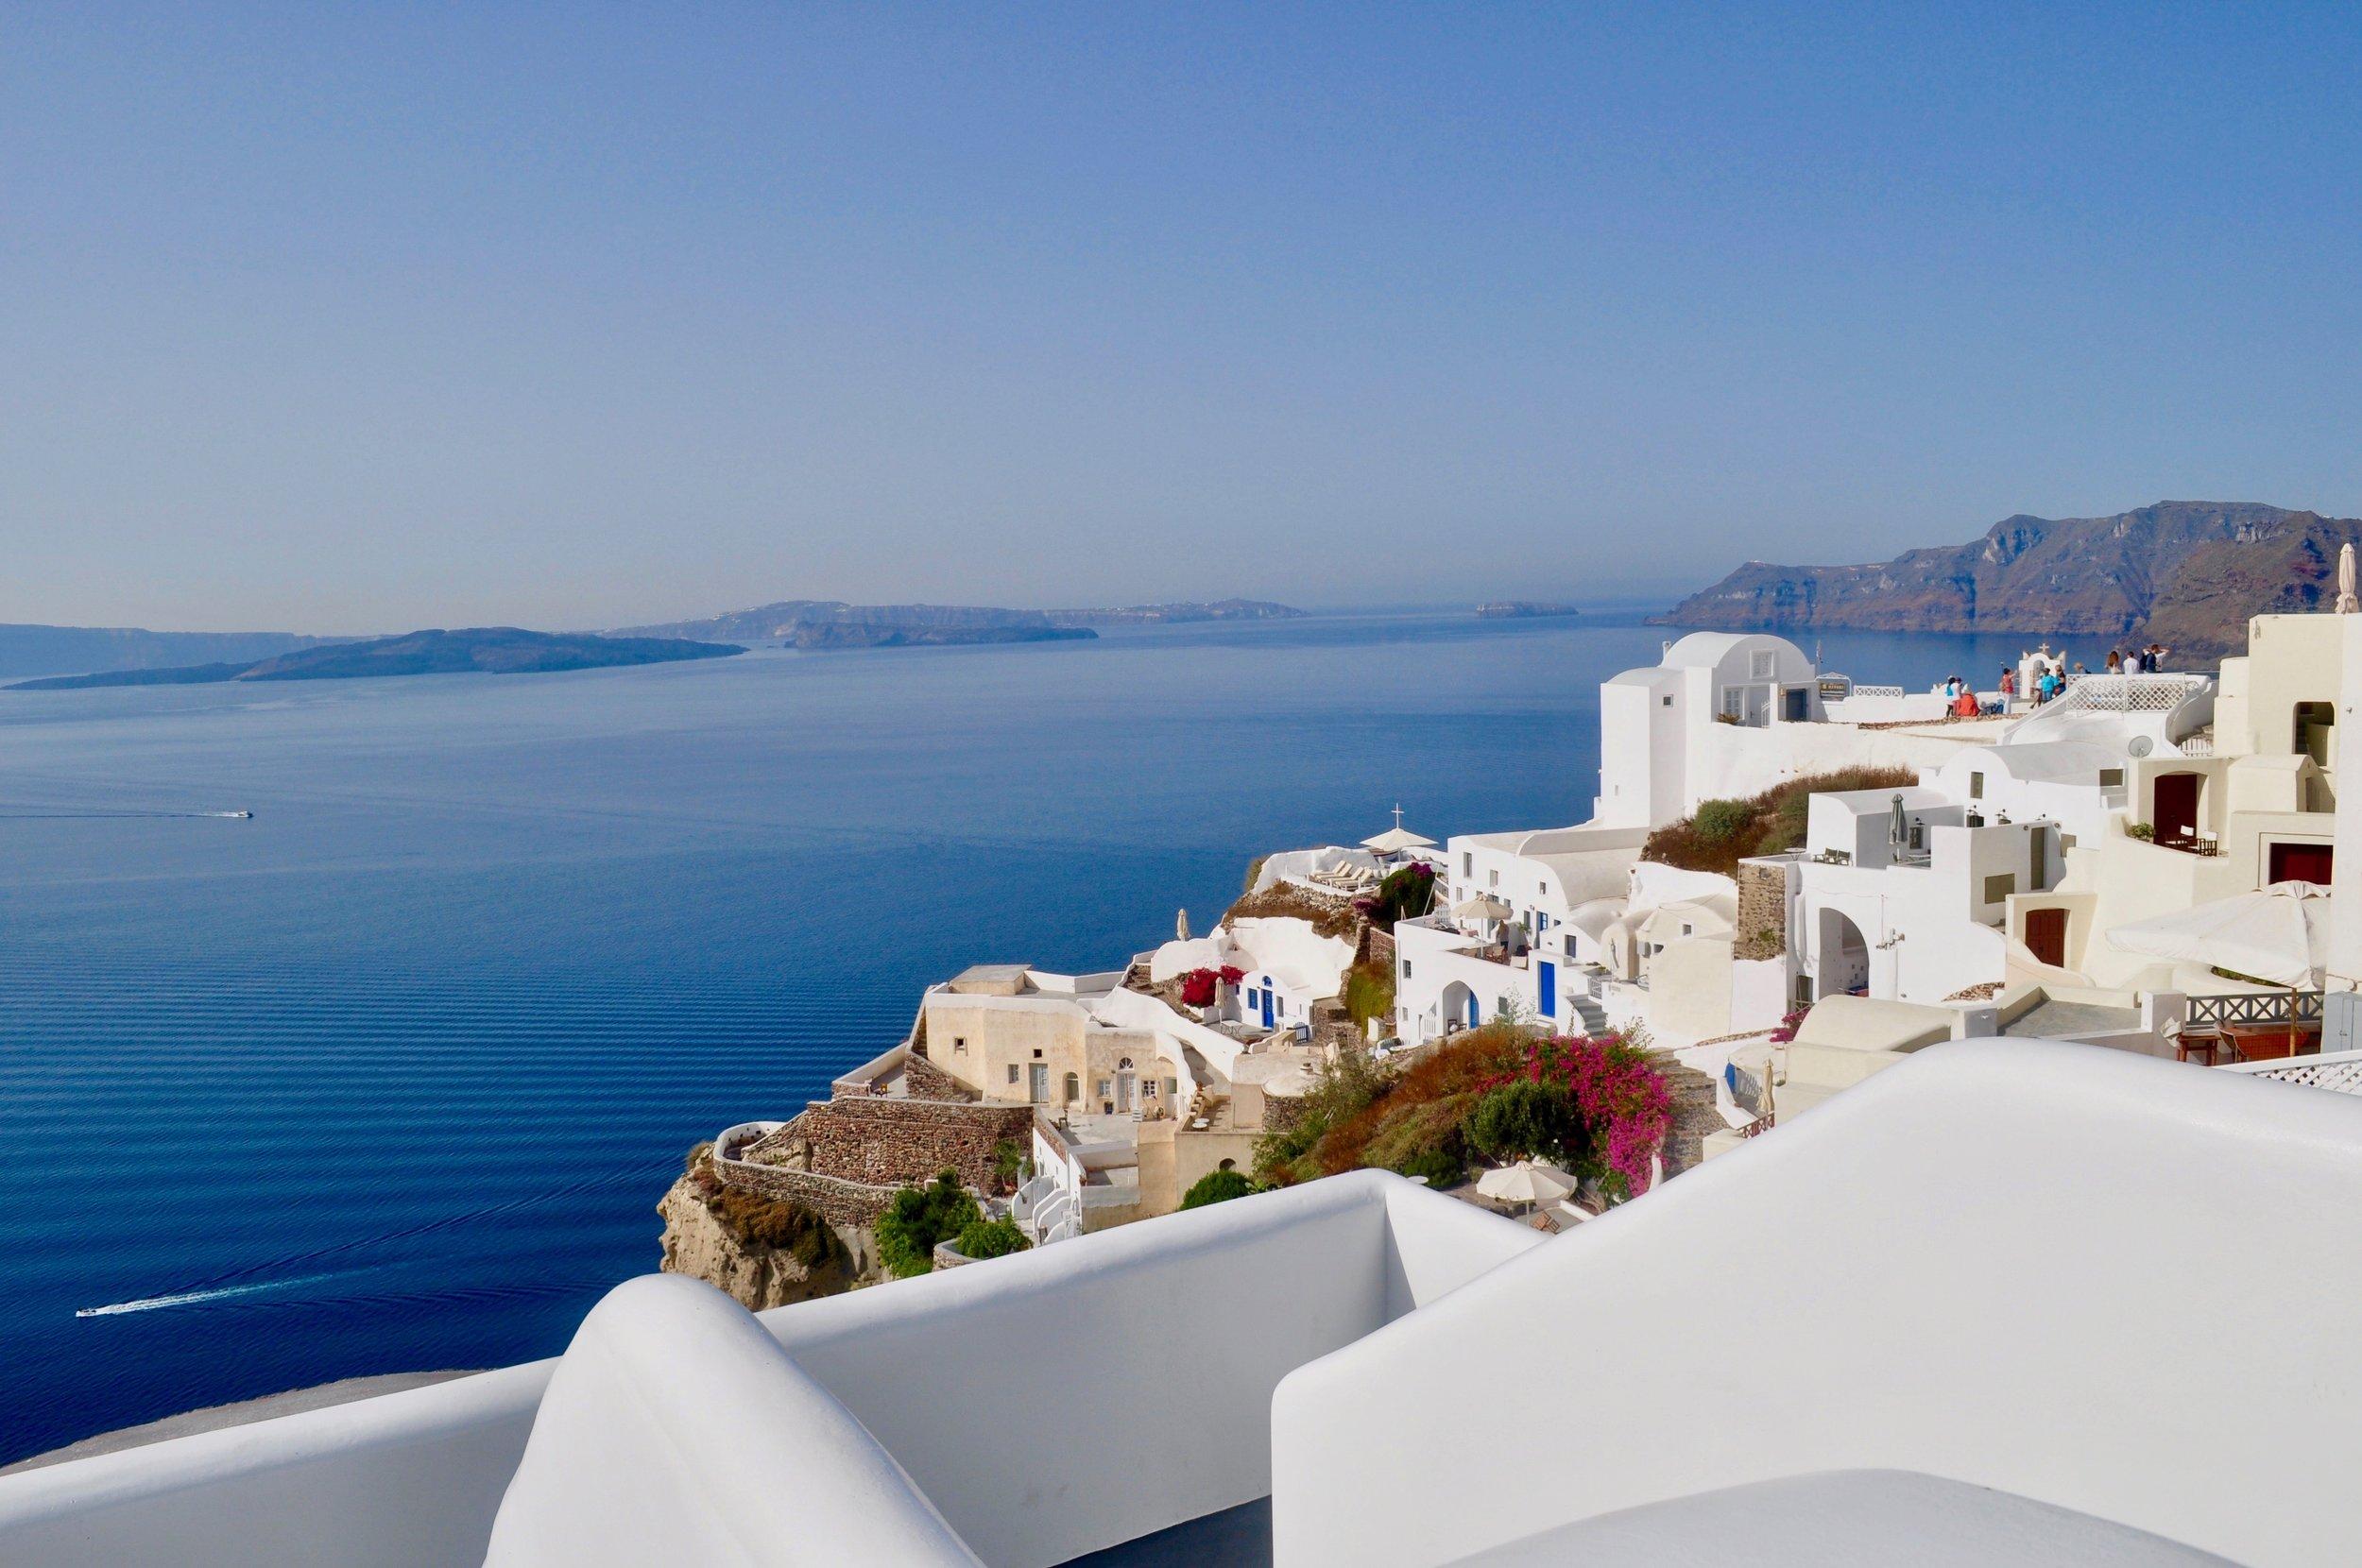 Exploring the Greek Isles on a Cruise - A Happy Passport #greece #santorini #oia #cruise